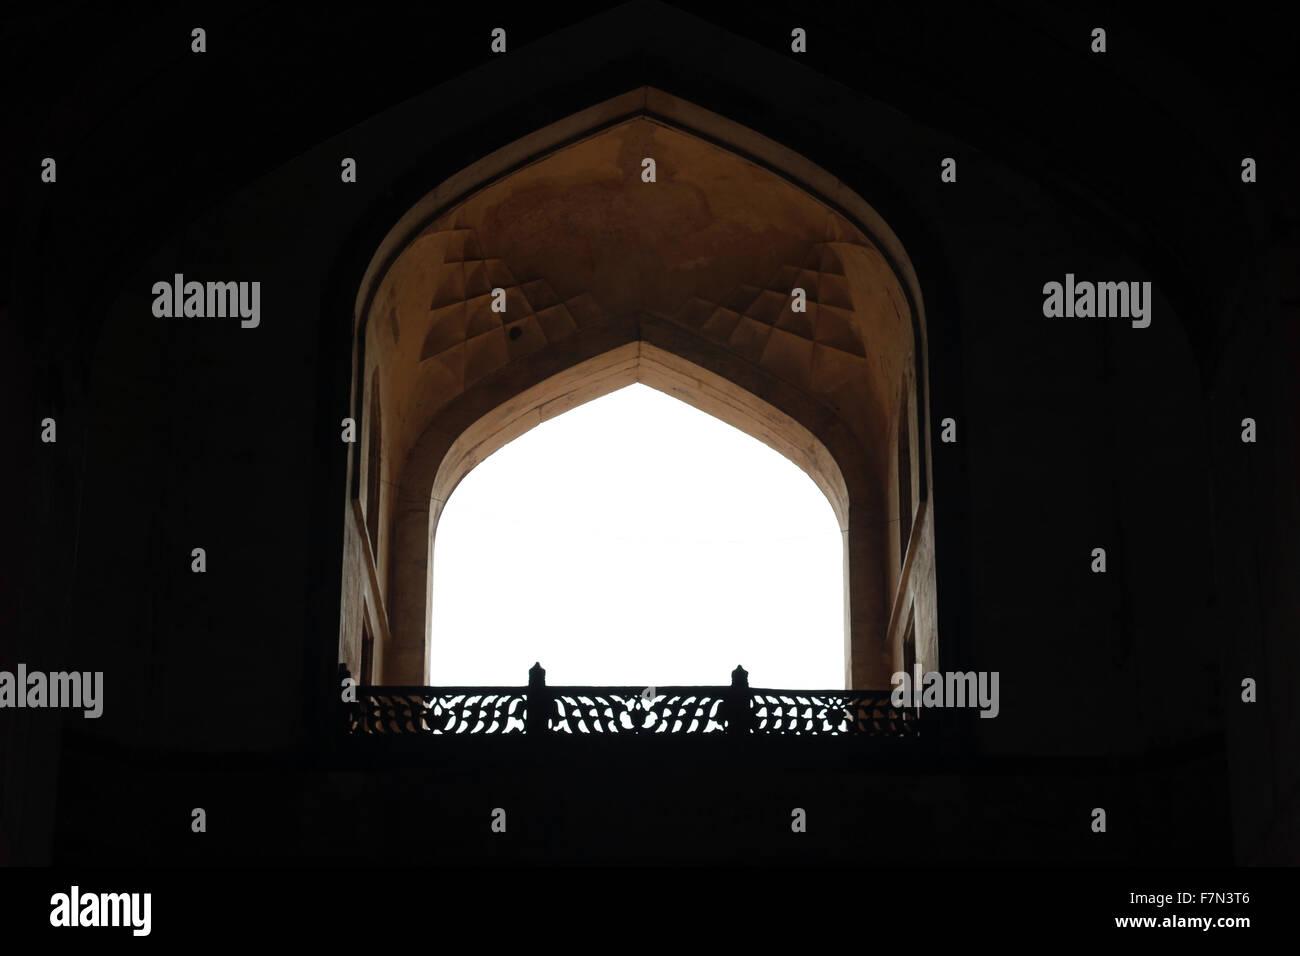 Colorful,Indian architecture, architecture, ancient architecture, Mugal architecture, window architecture Stock Photo